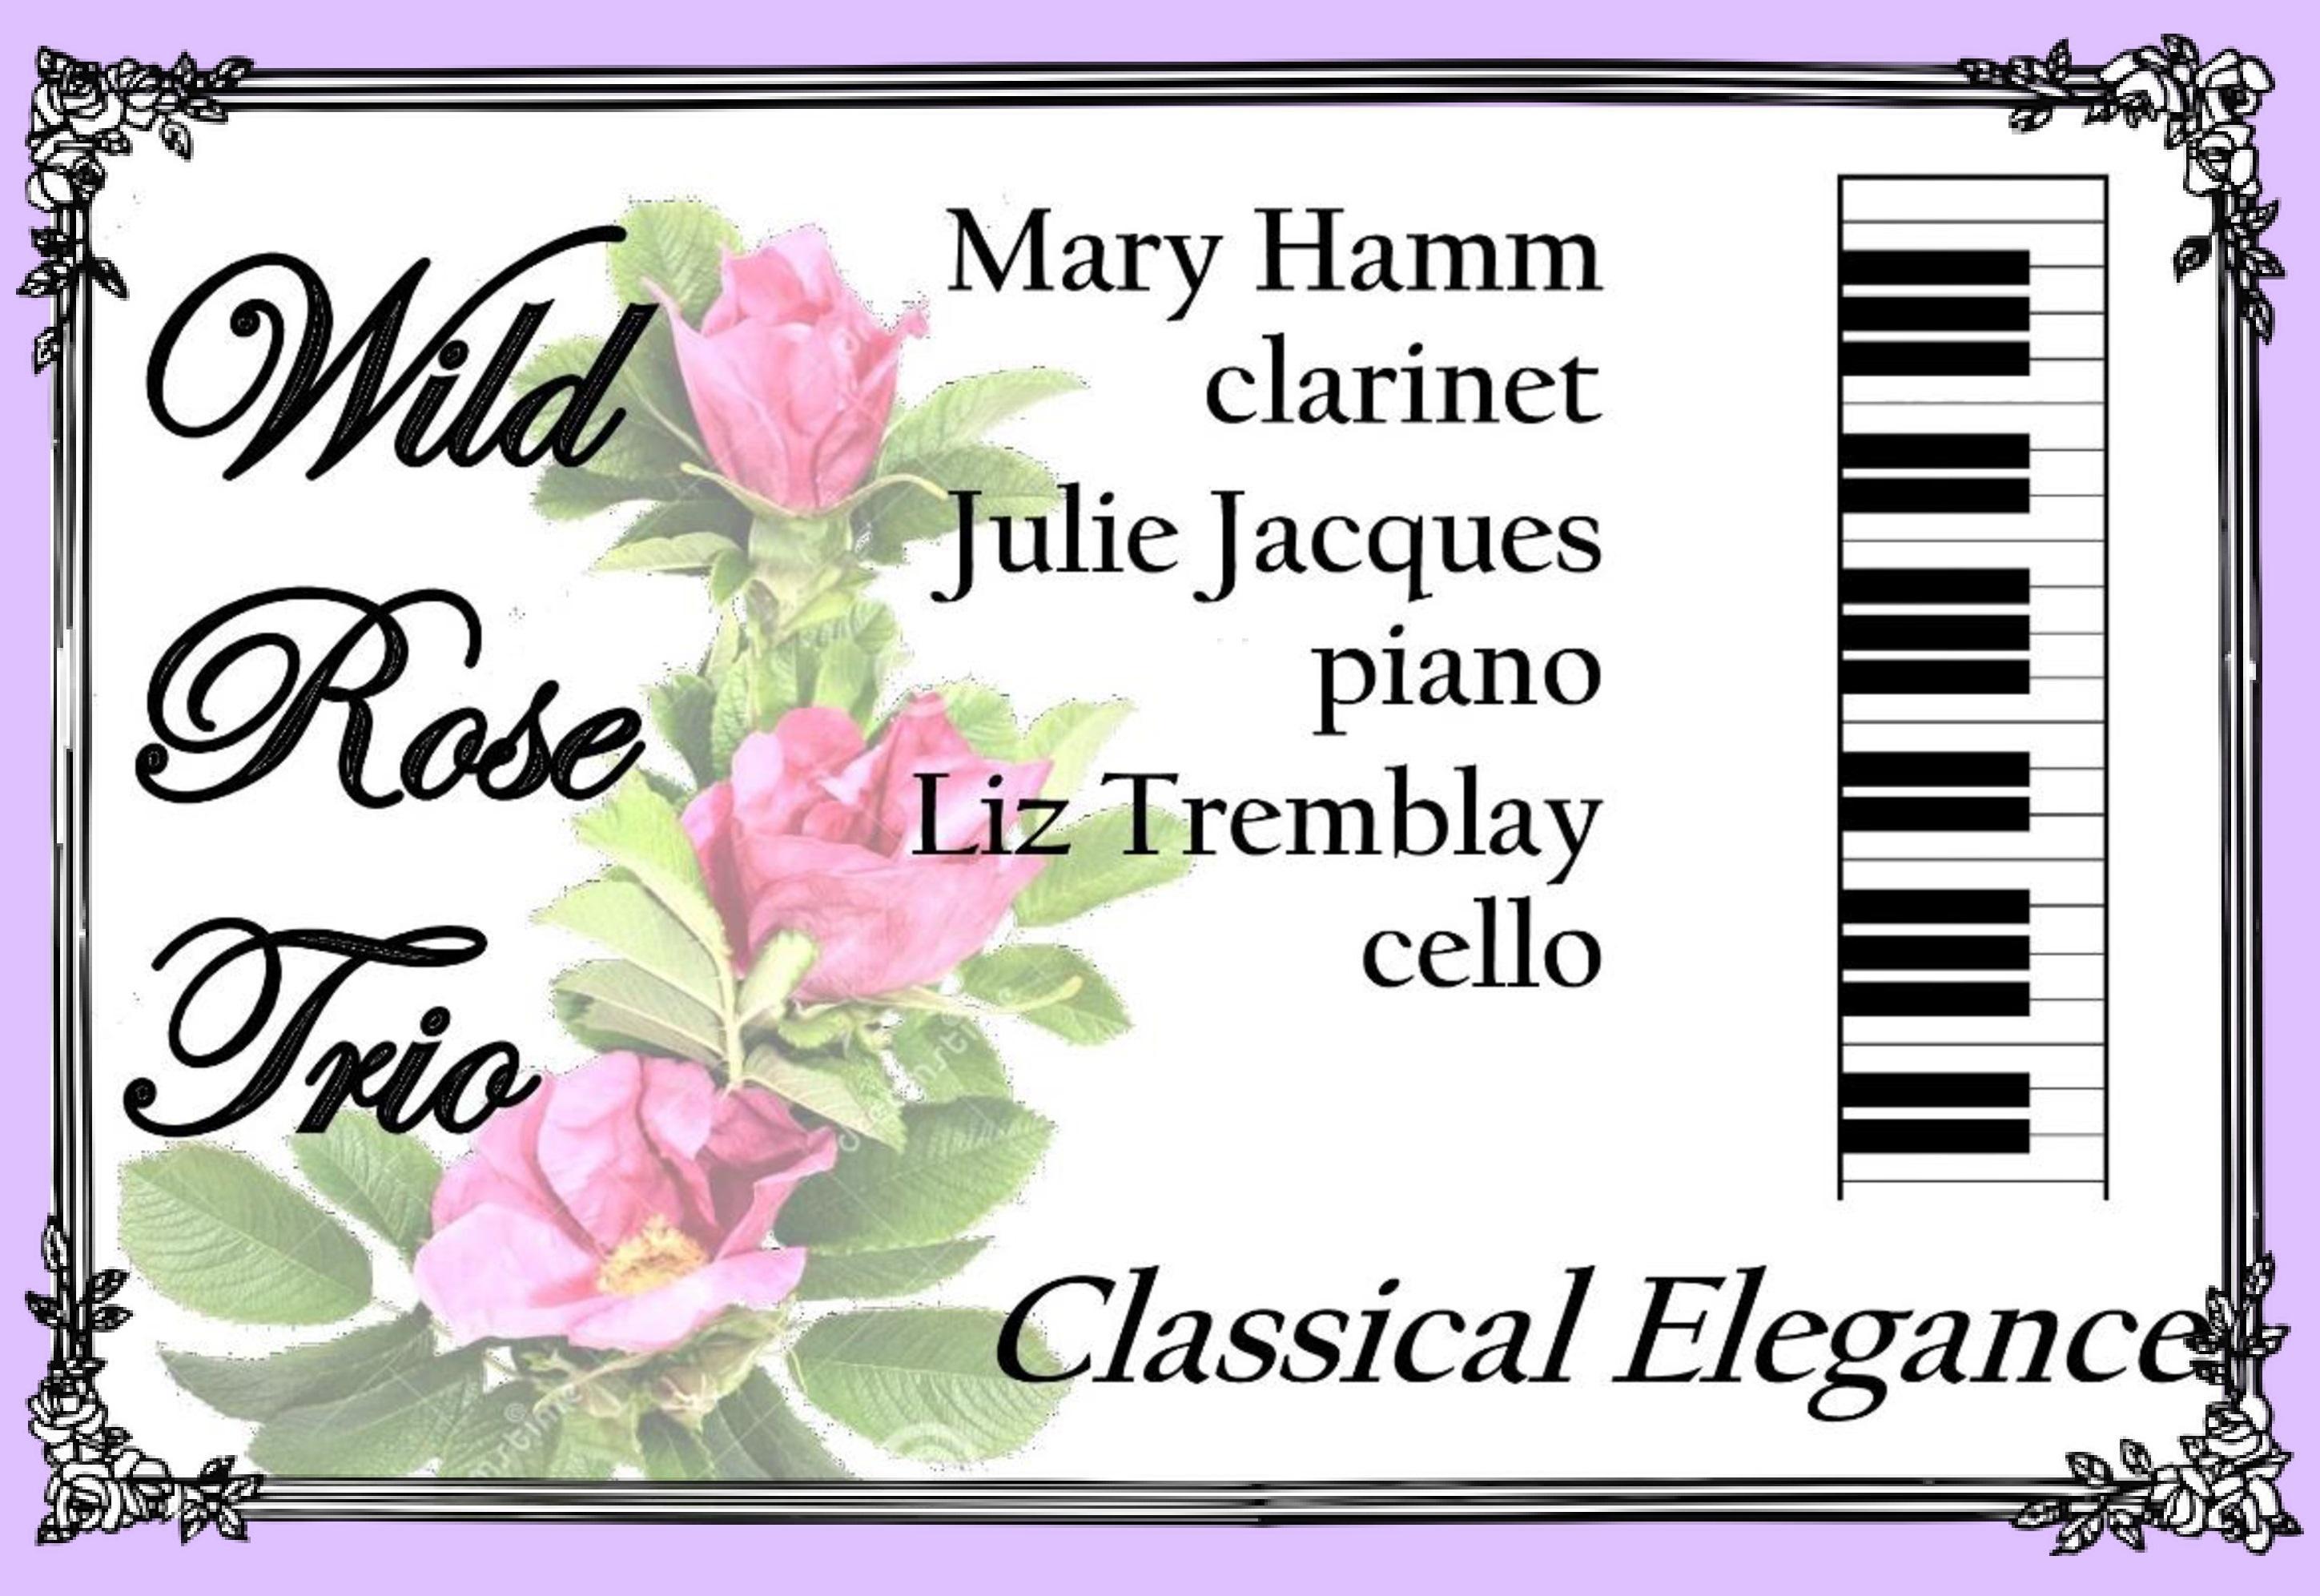 Wild Rose Trio, Sunday May 12 at 3 pm